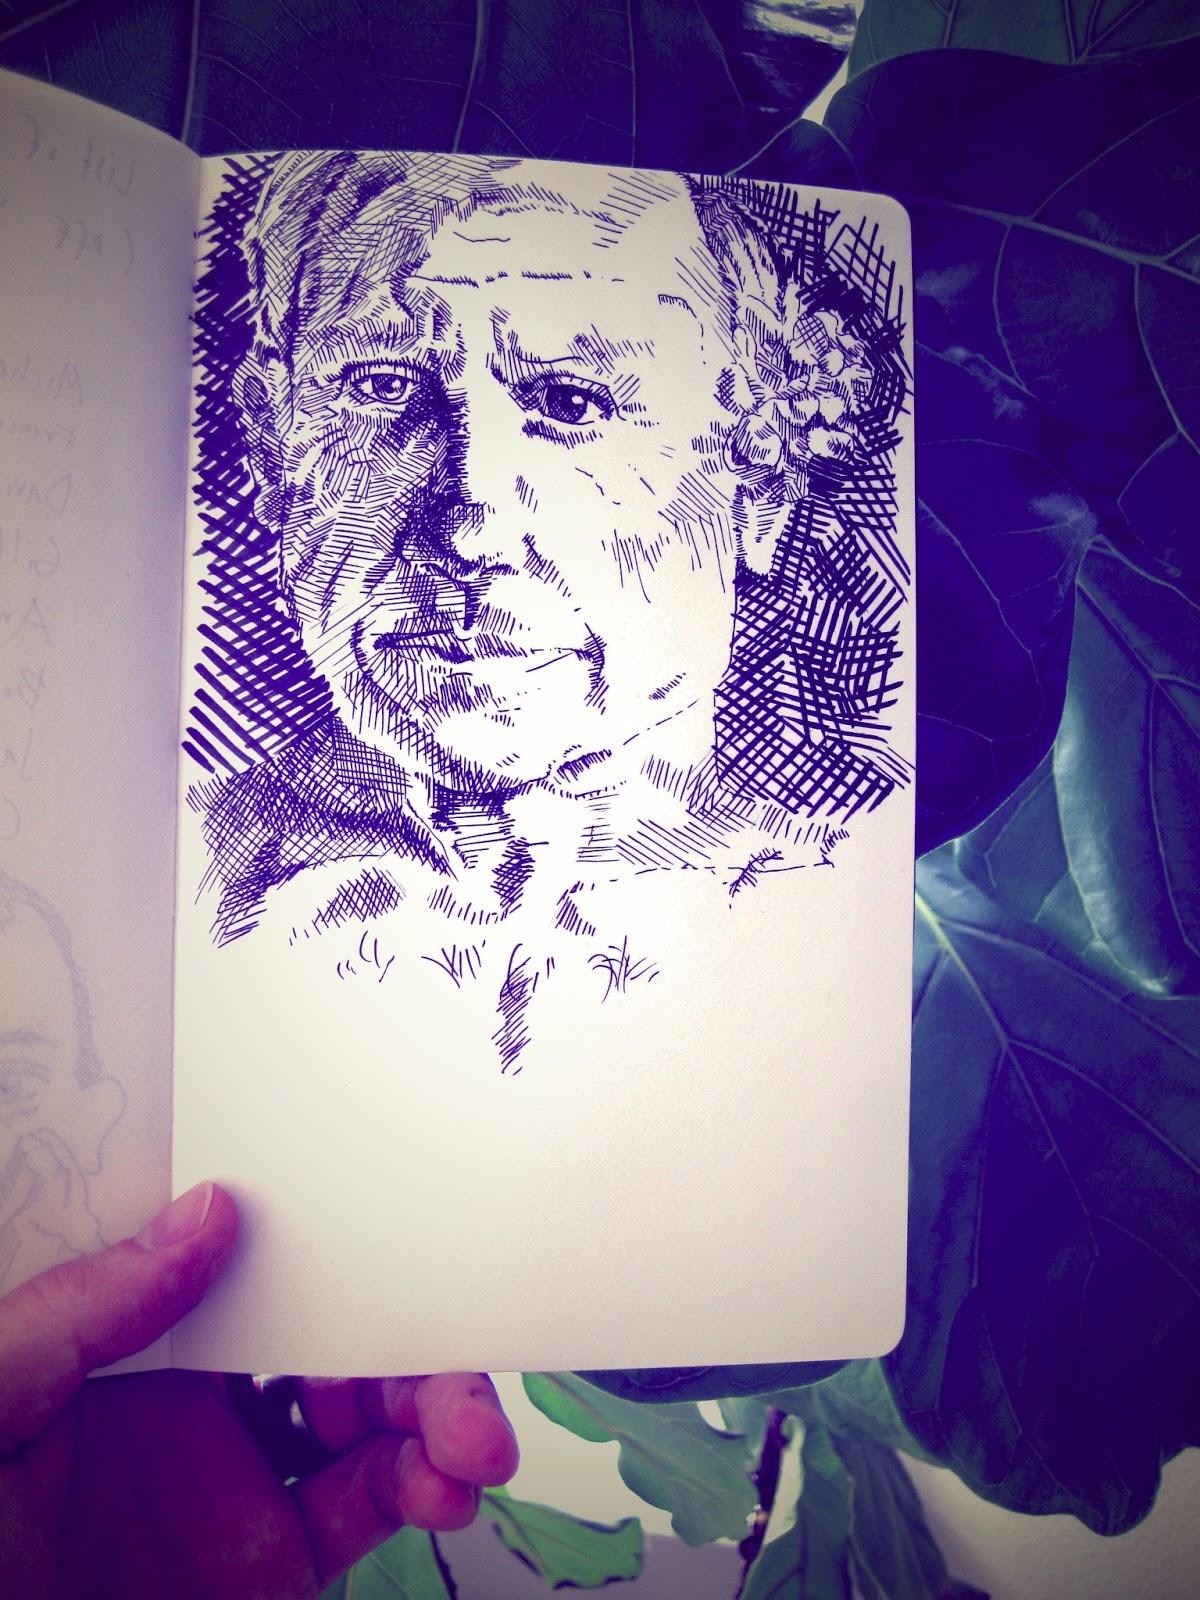 http://3.bp.blogspot.com/-lNcIs5xGnjI/URk6IAE1taI/AAAAAAAABOE/x6ZIQqCKVMw/s1600/picasso_sketch.jpg